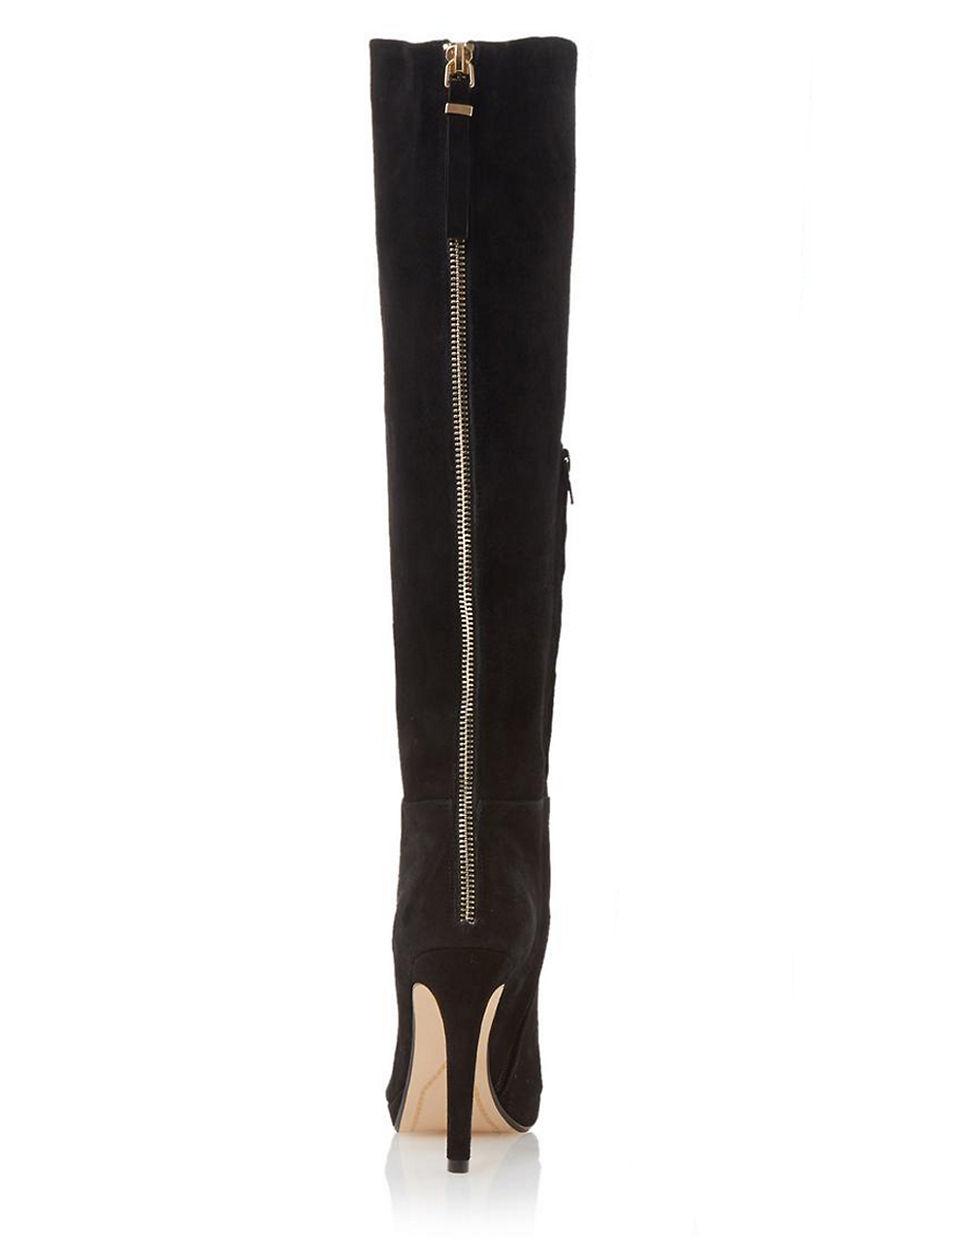 dune skyler suede knee high boots in black lyst